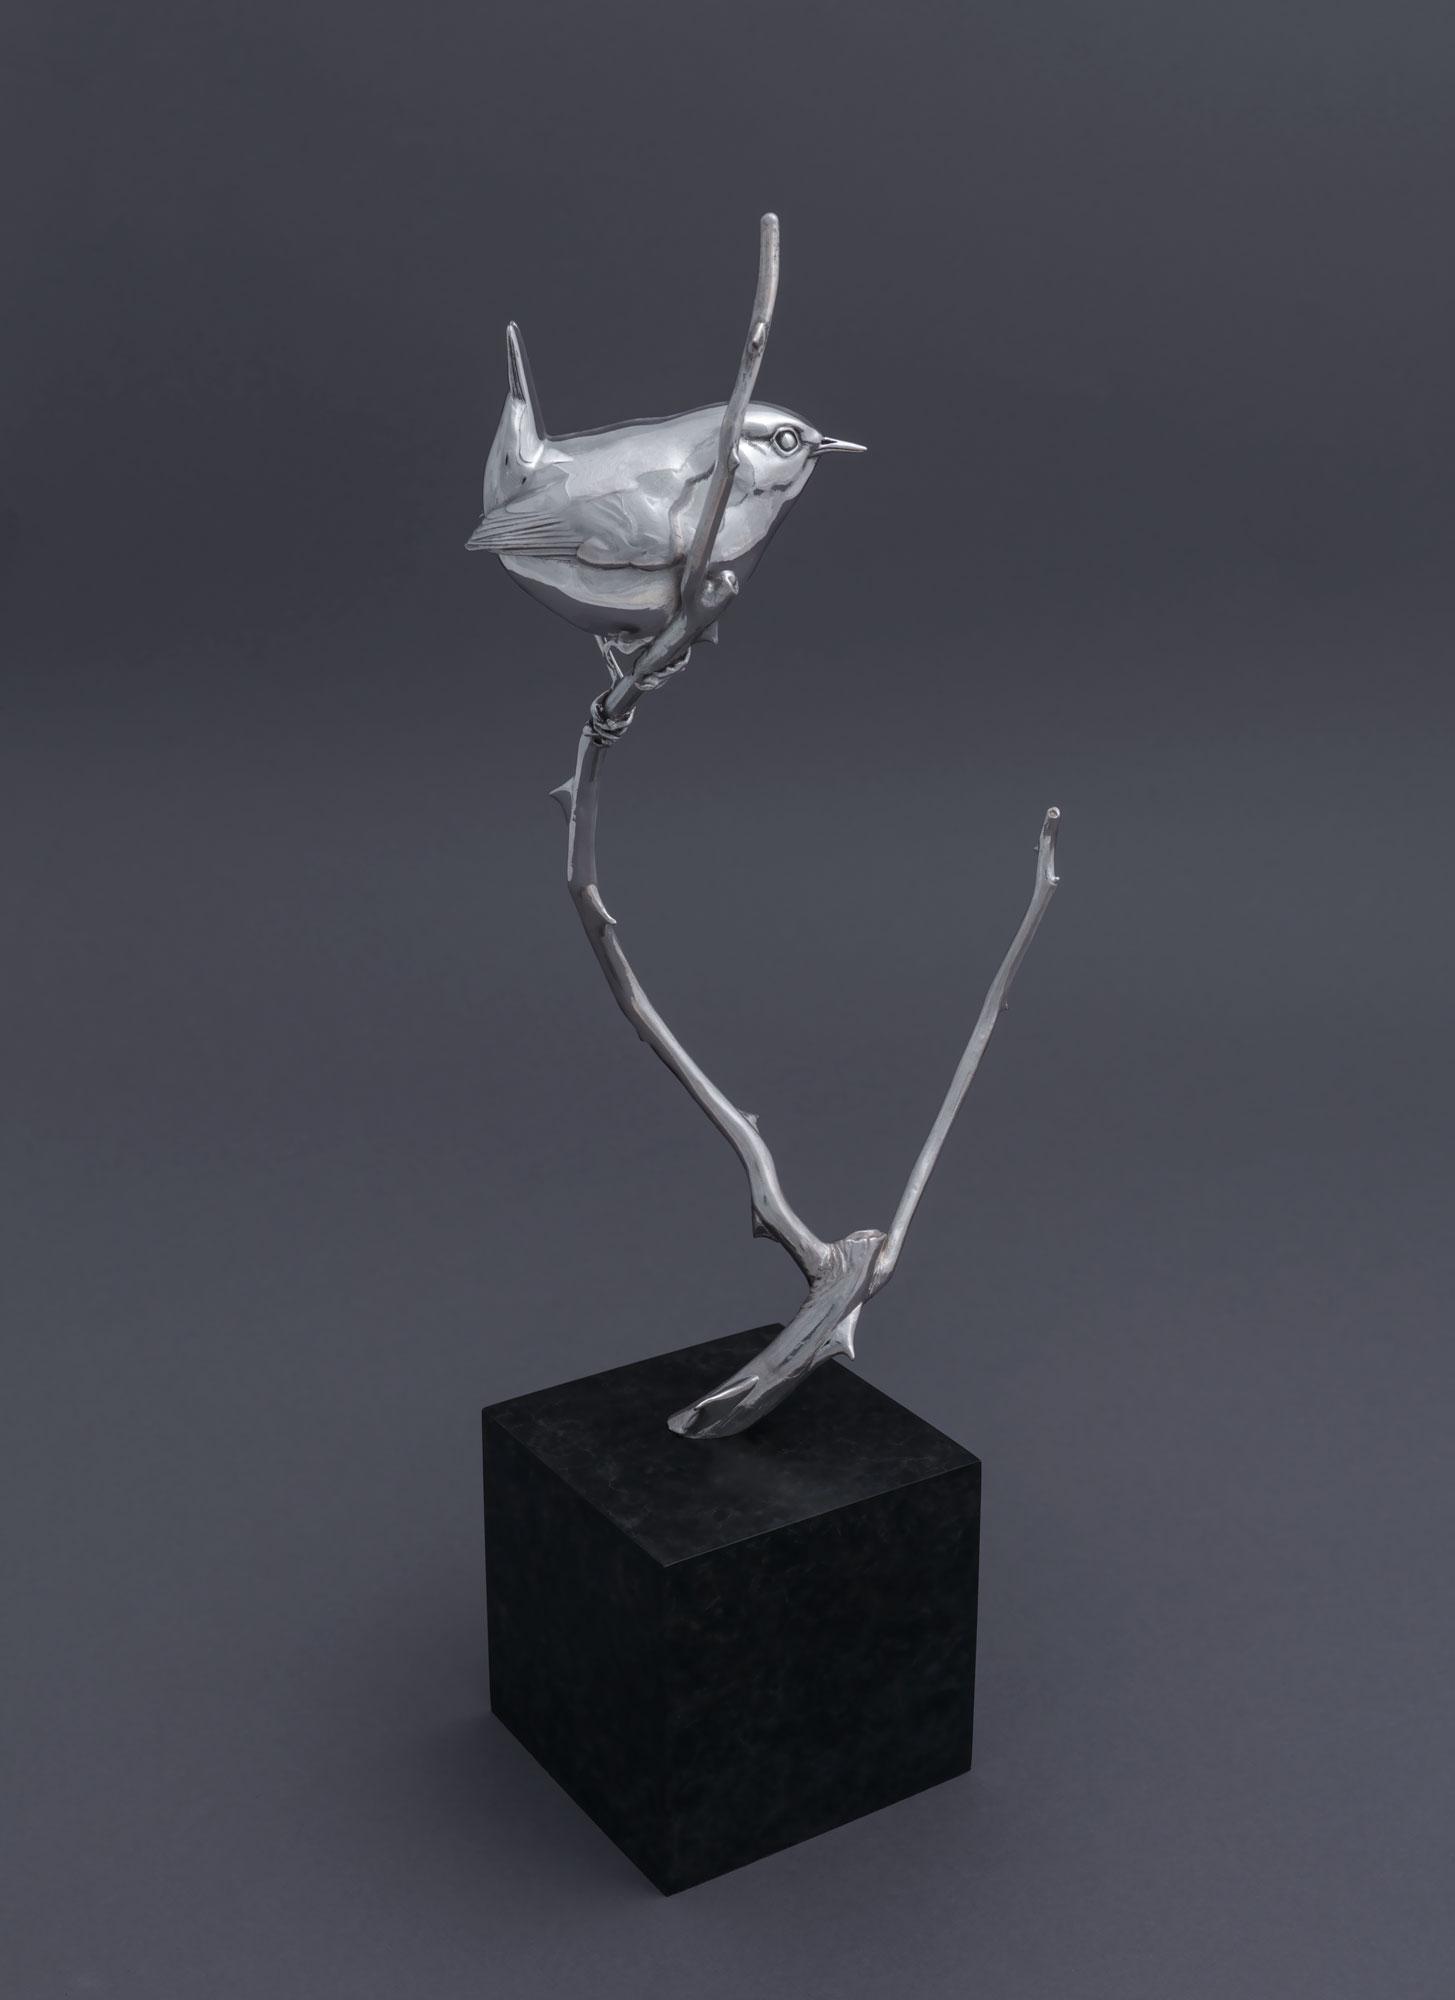 8.1 Silver Wren II by Nick Bibby, Edition of 25, 13 x 5 x 3.5inches (33 x 13 x 9cm).jpg